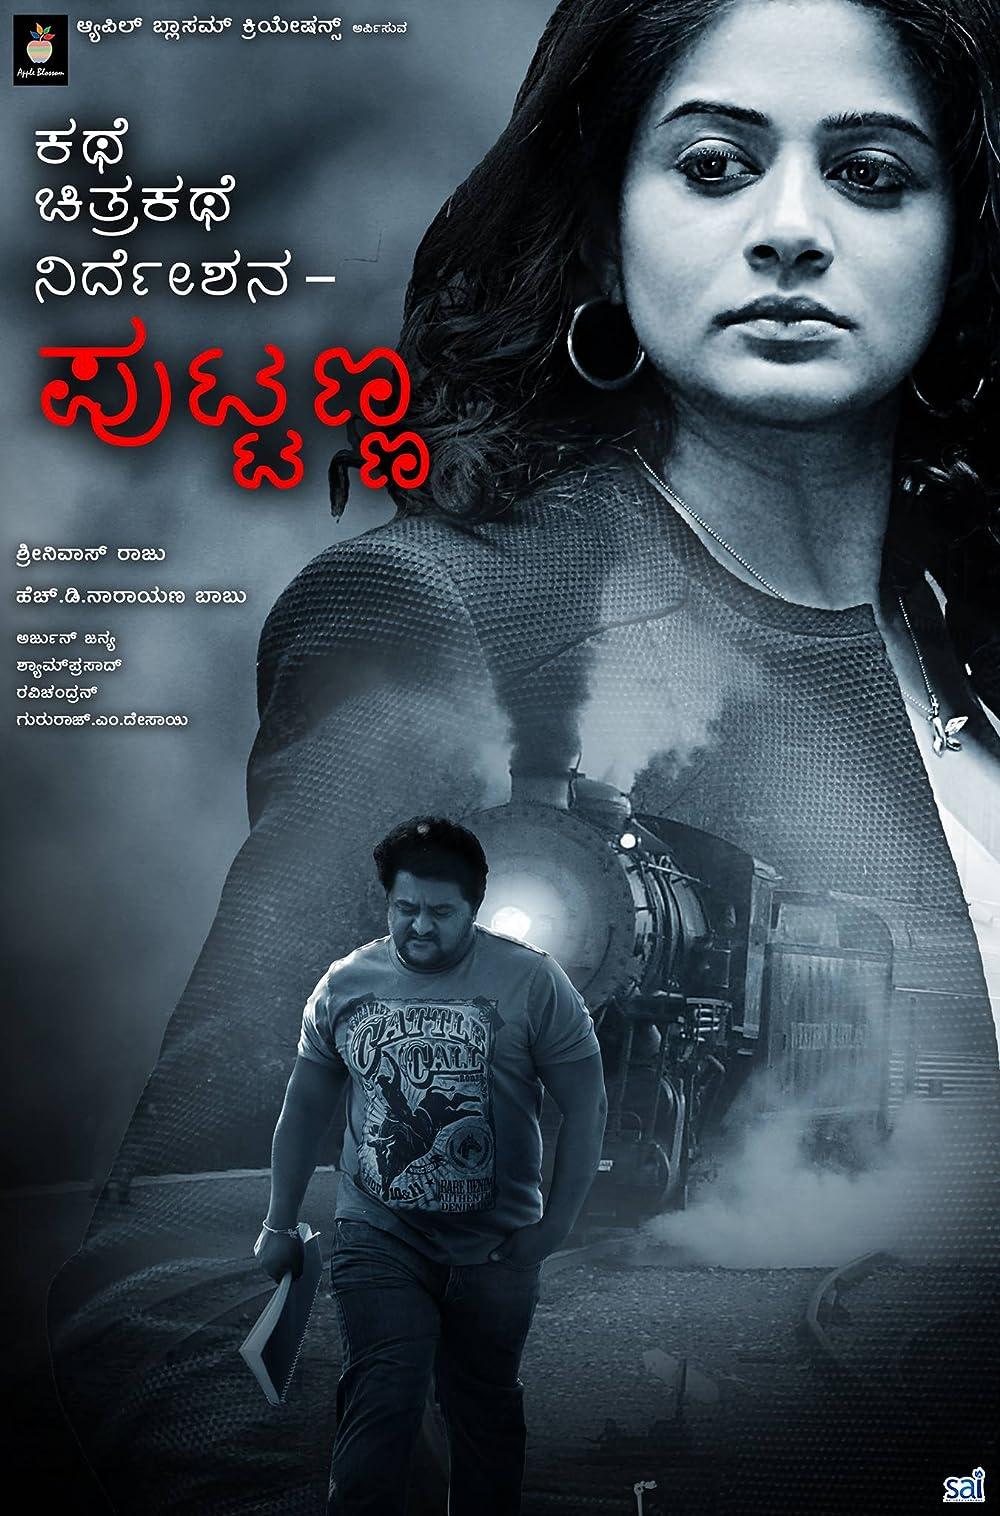 Bhagmati Returns (Kathe Chitrakathe Nirdeshana Puttanna) 2021 Hindi Dubbed 720p HDRip 900MB Download